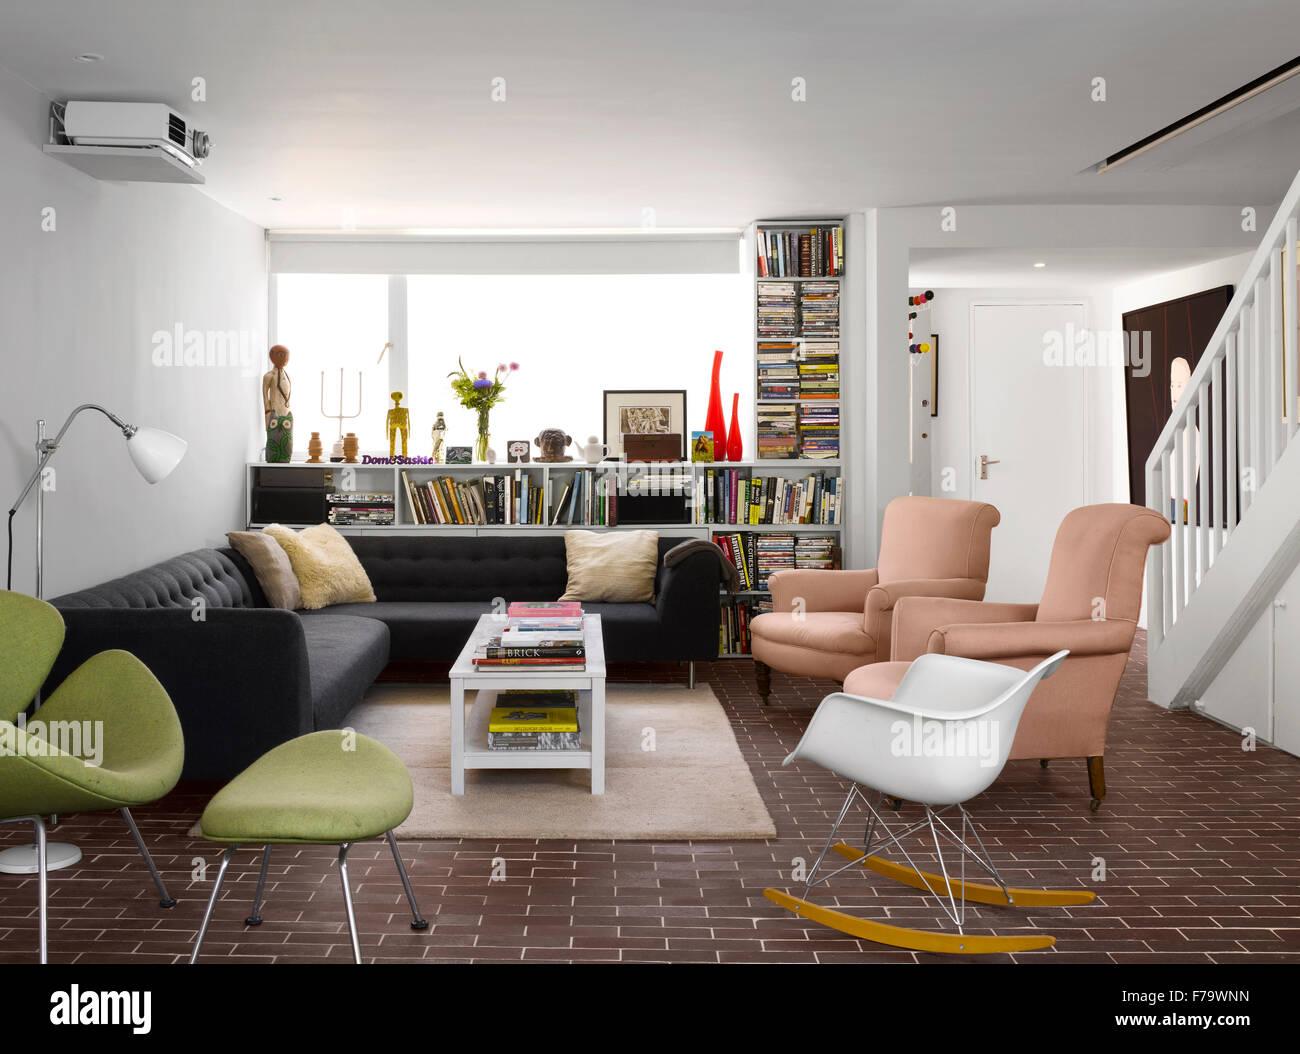 Lounge  in refurbished 1960s social housing, Vauxhall, London, England, UK - Stock Image